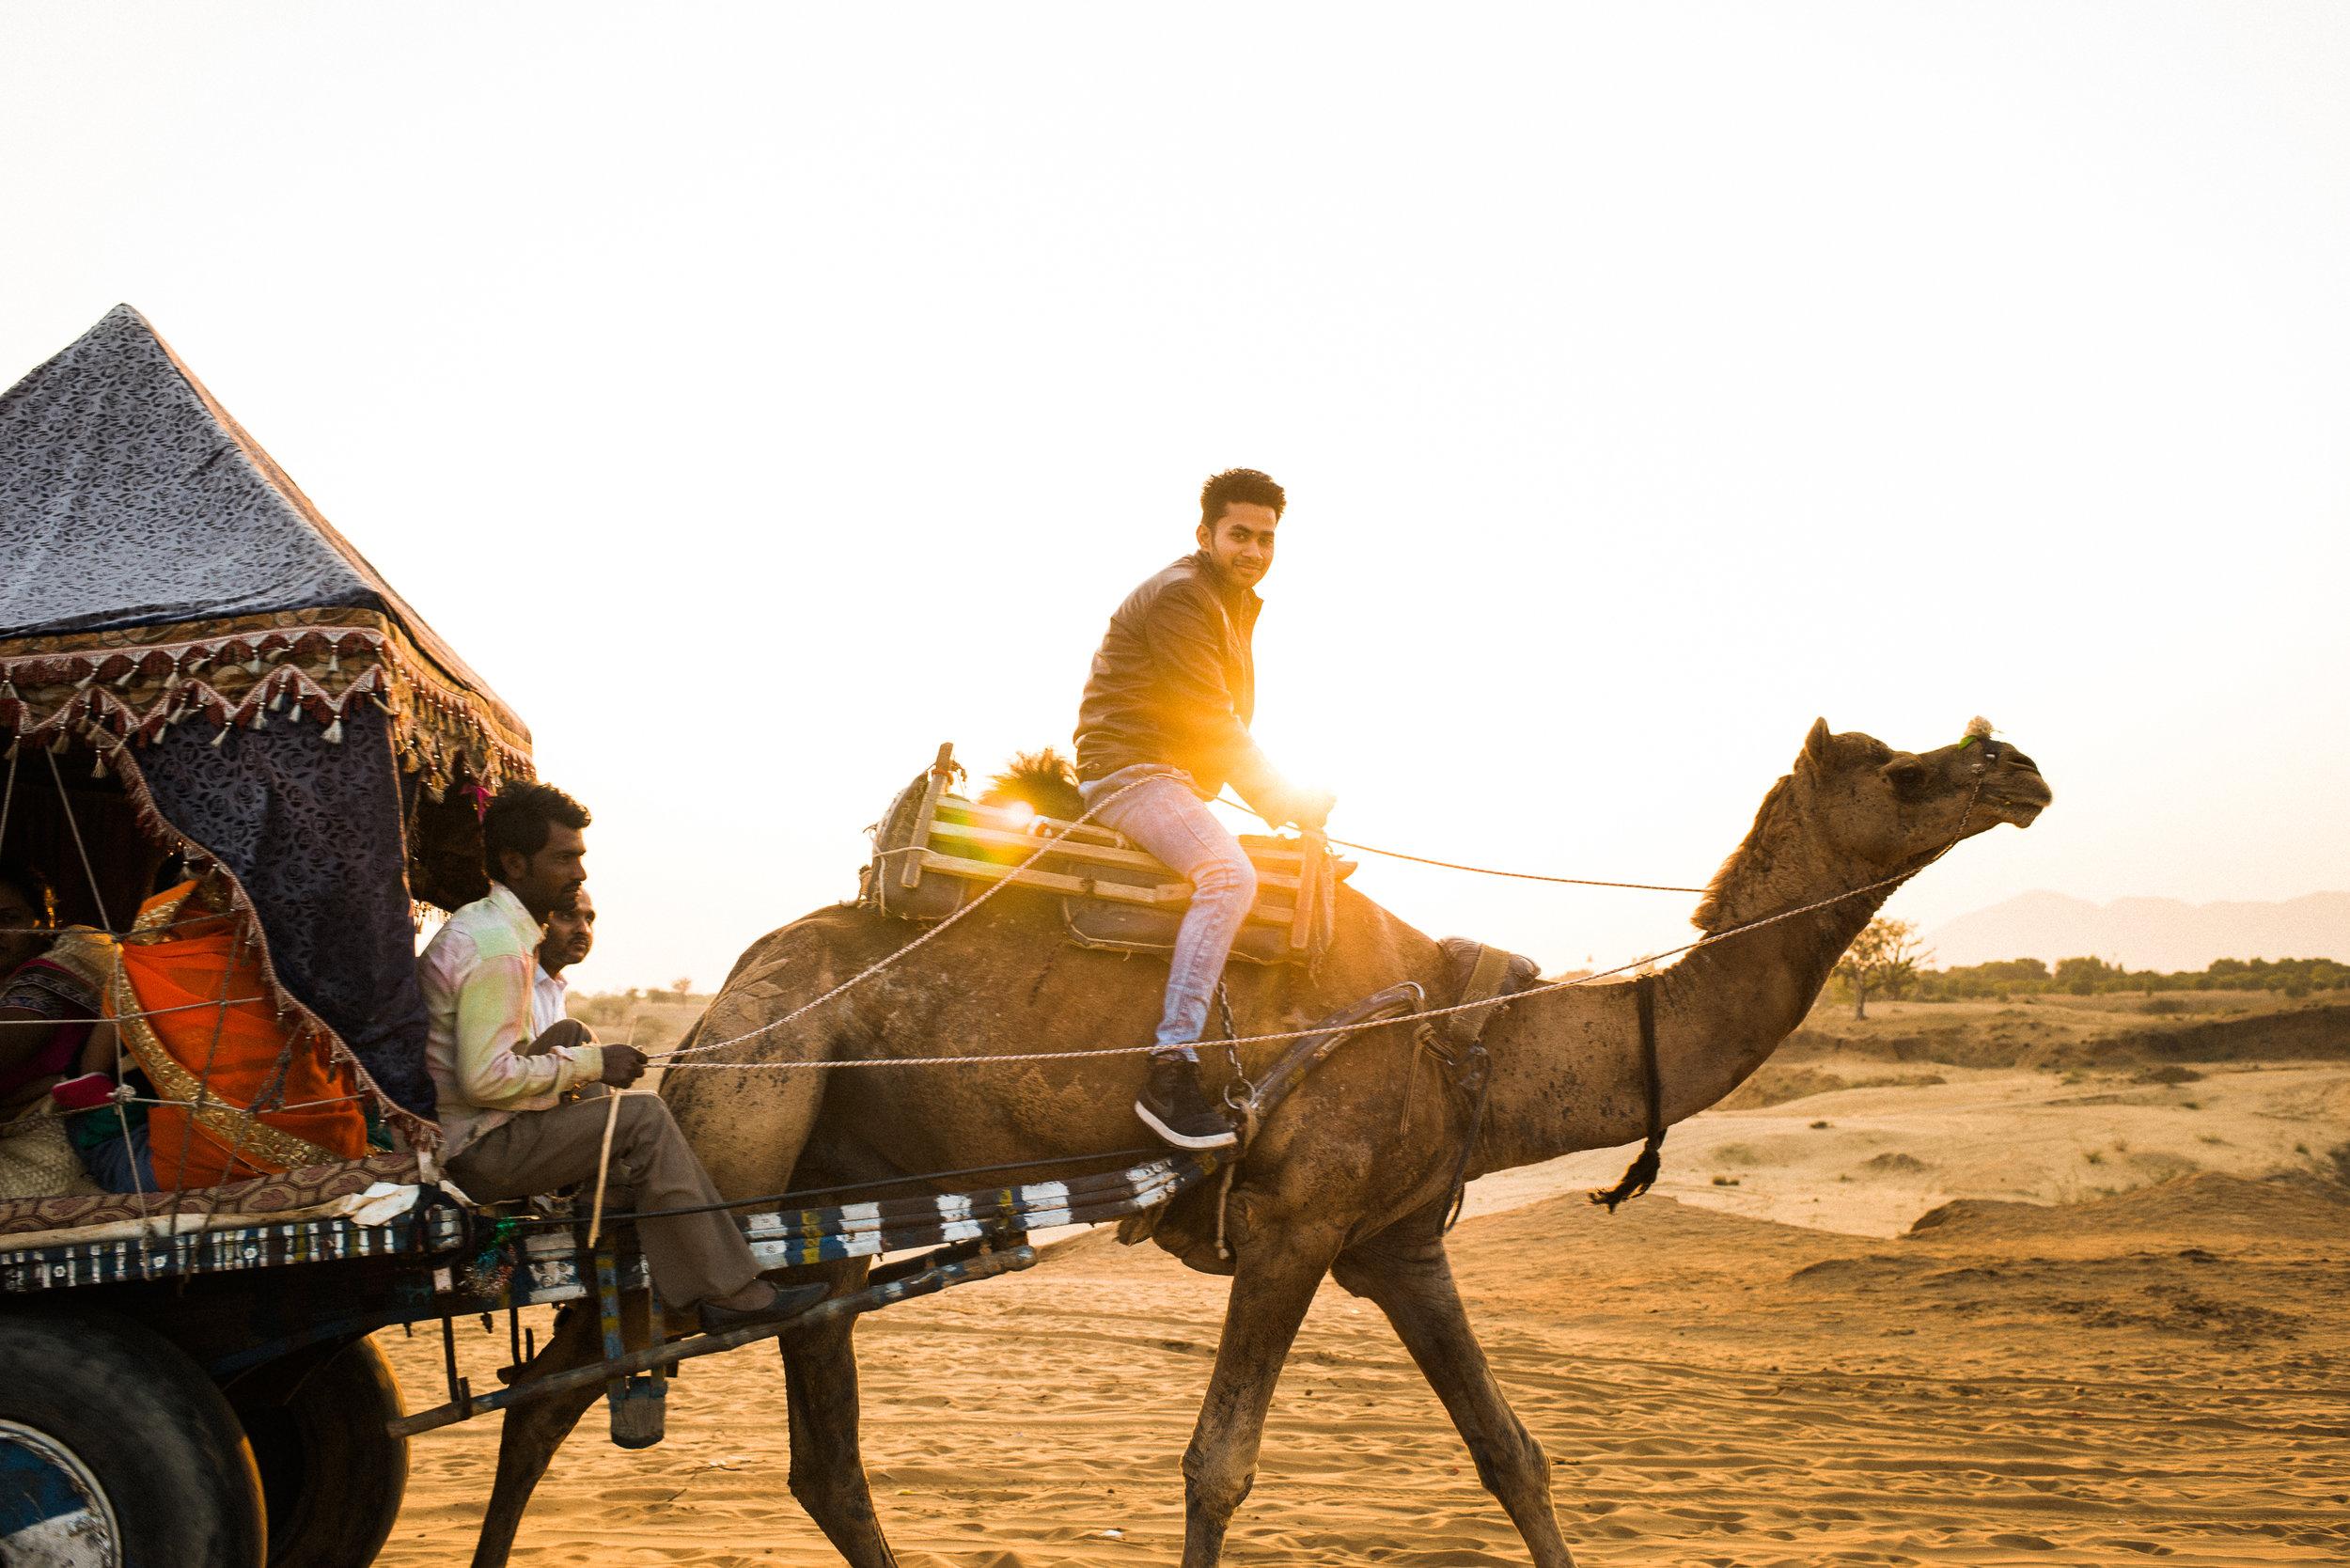 Pushkar_India_TaraShupe_Photography_067.jpg